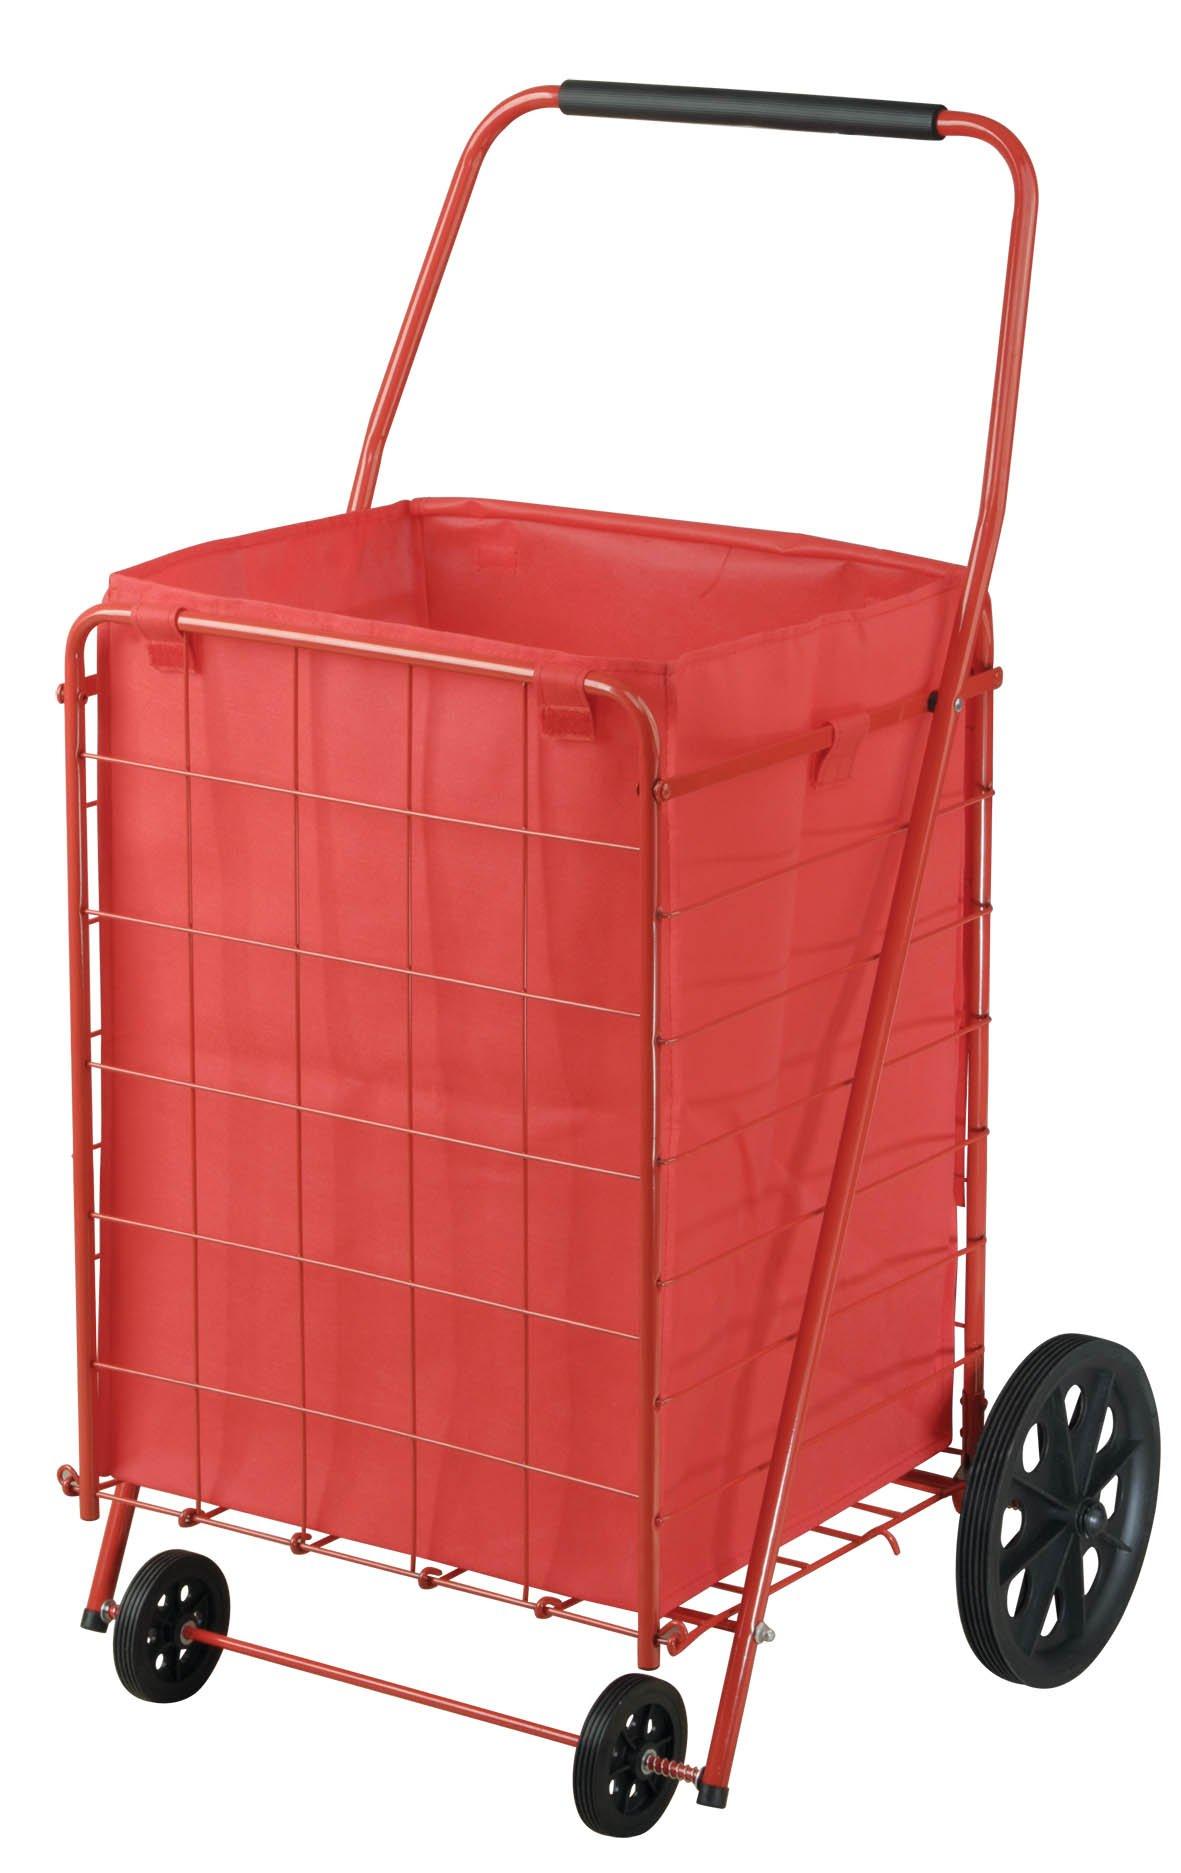 Sandusky FSC4021 Folding Shopping Cart, 110 lbs Capacity